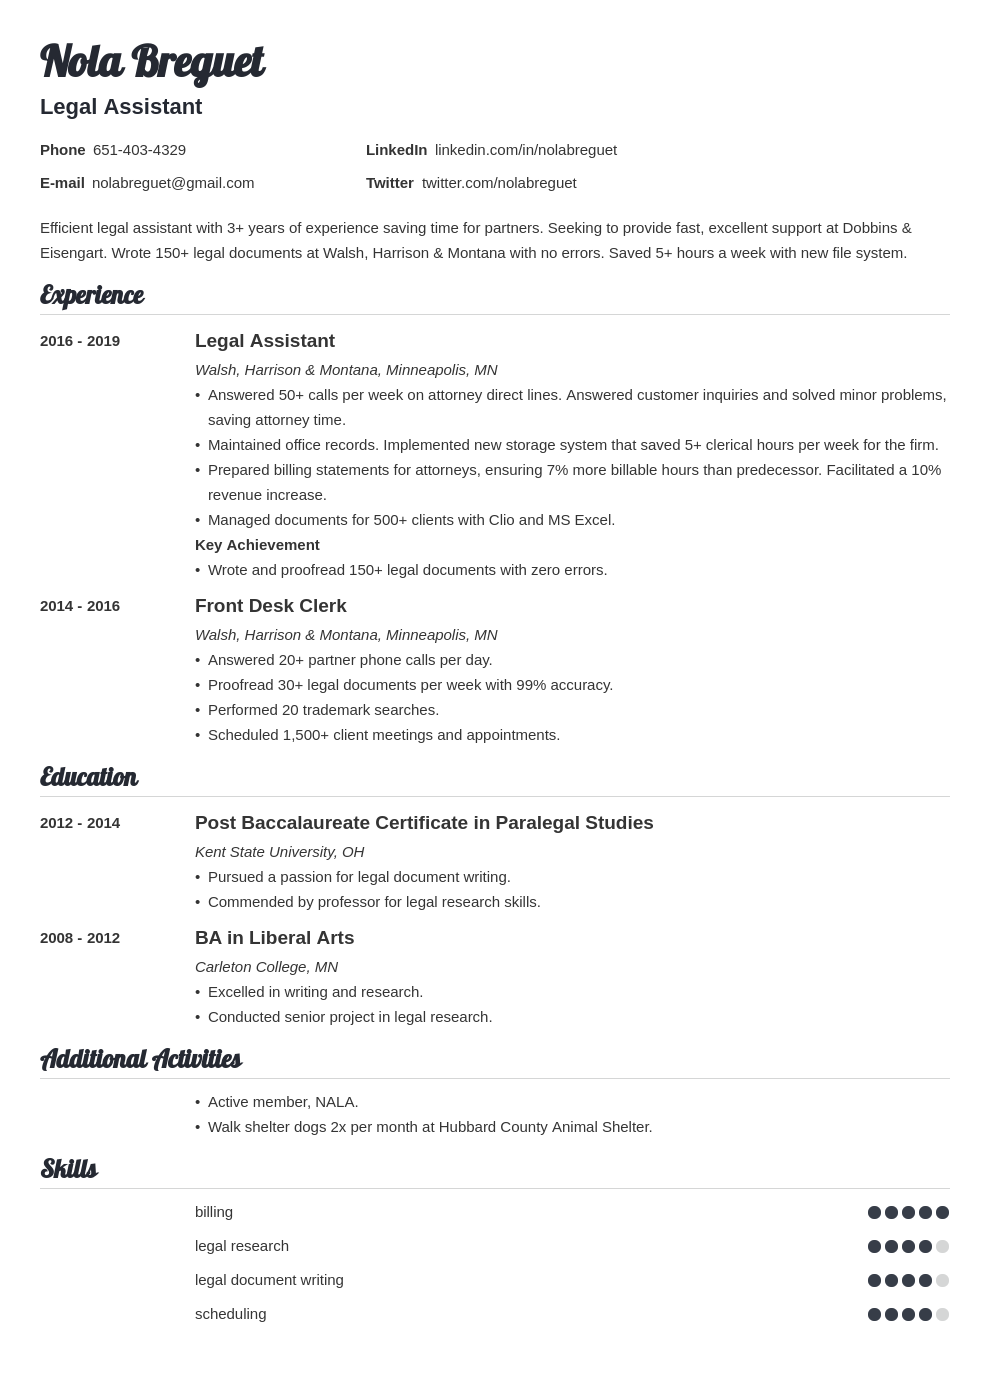 legal assistant template valera uk